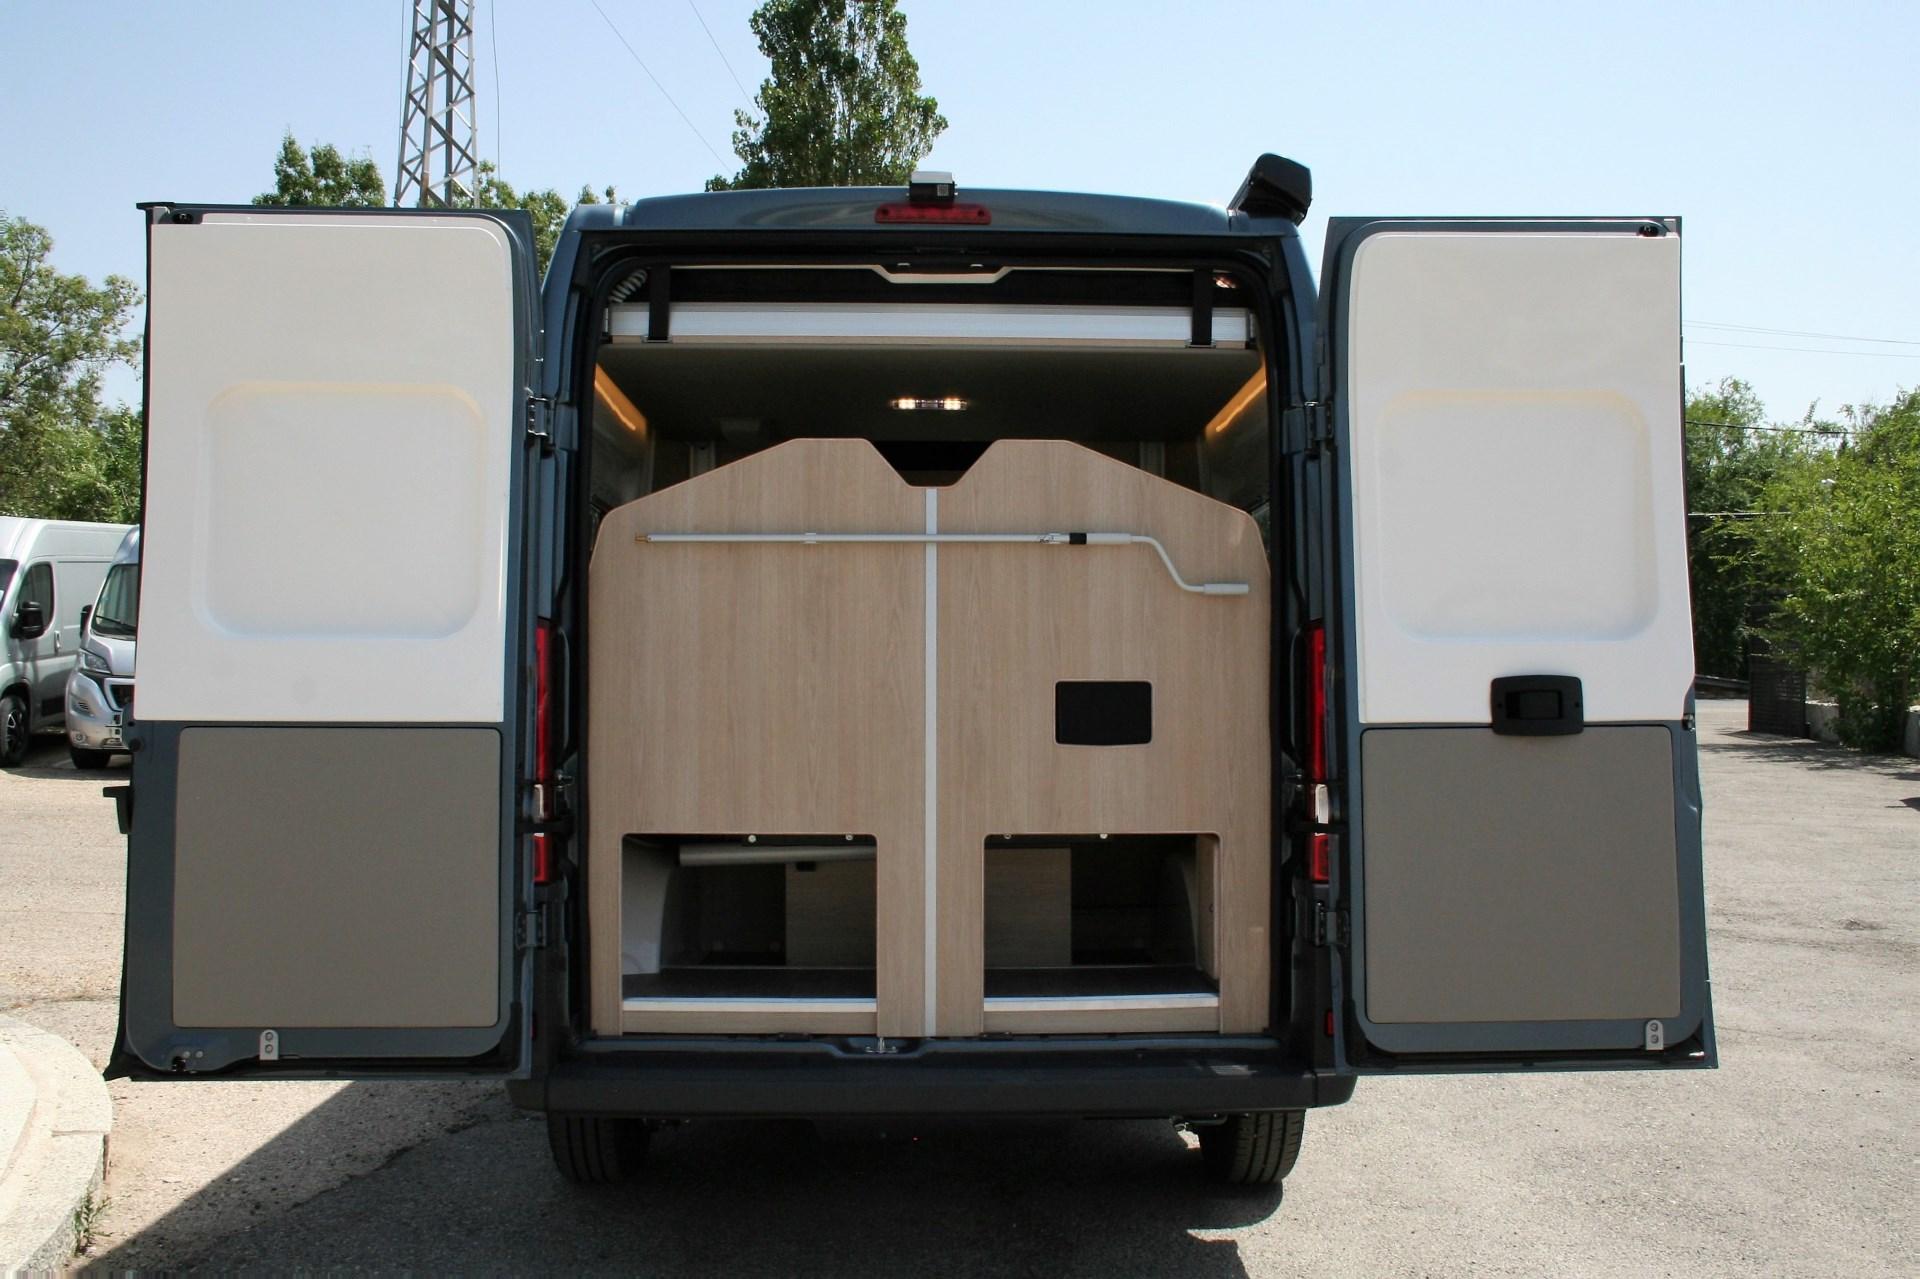 Family S L2H2 Fiat Ducato Bunkervan (32)